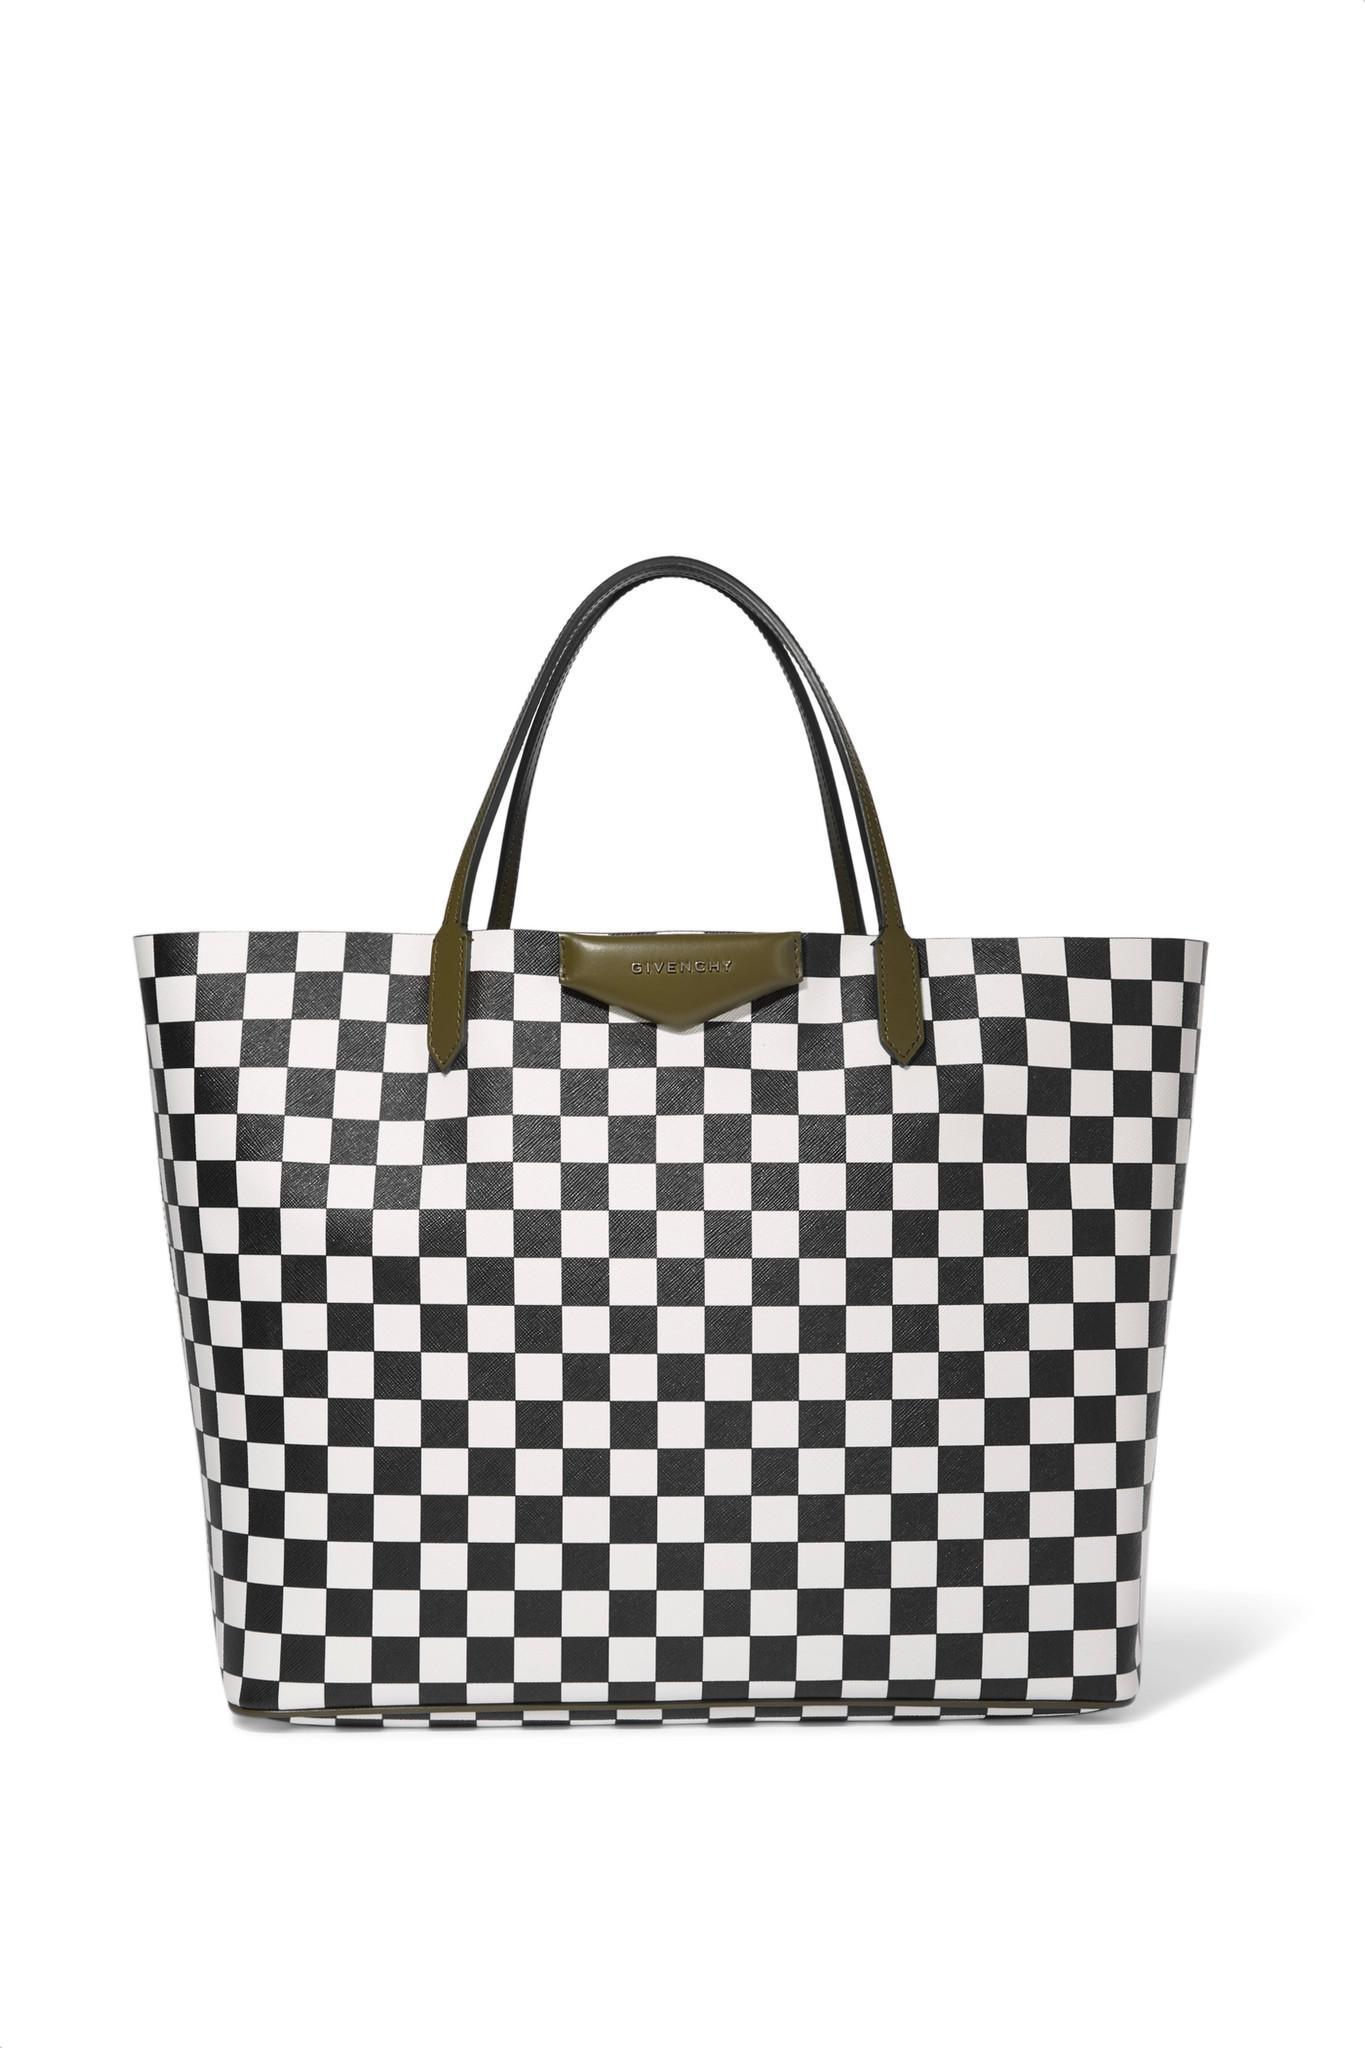 Givenchy Antigona Shopping Large Checked Textured Leather